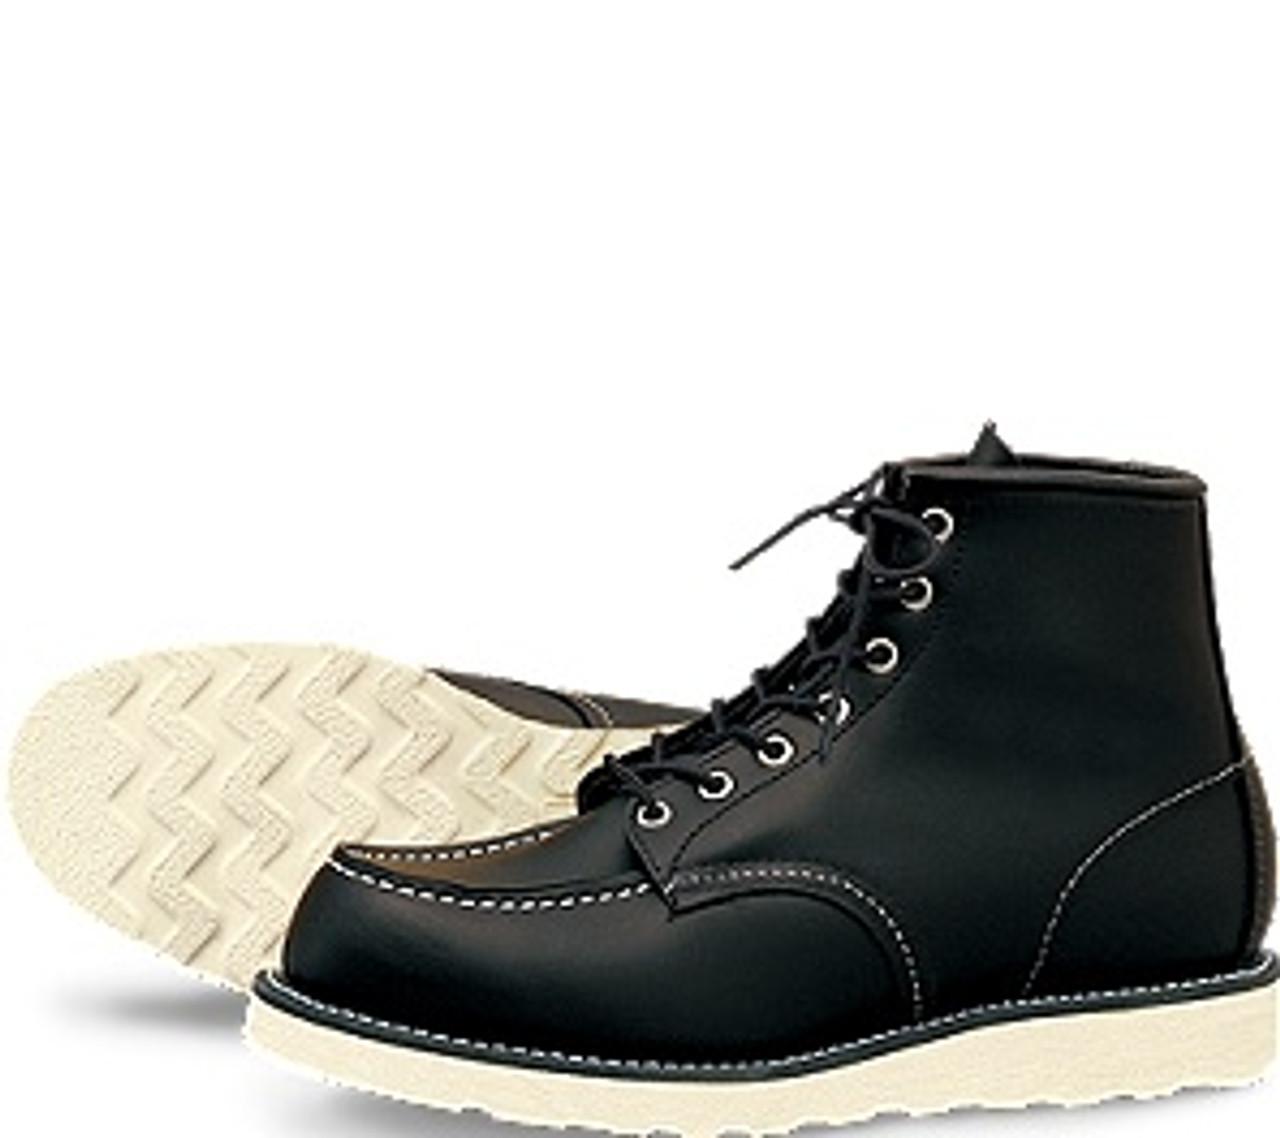 ebeb890b8cd Men's Red Wing Heritage Black Moc Toe Boot